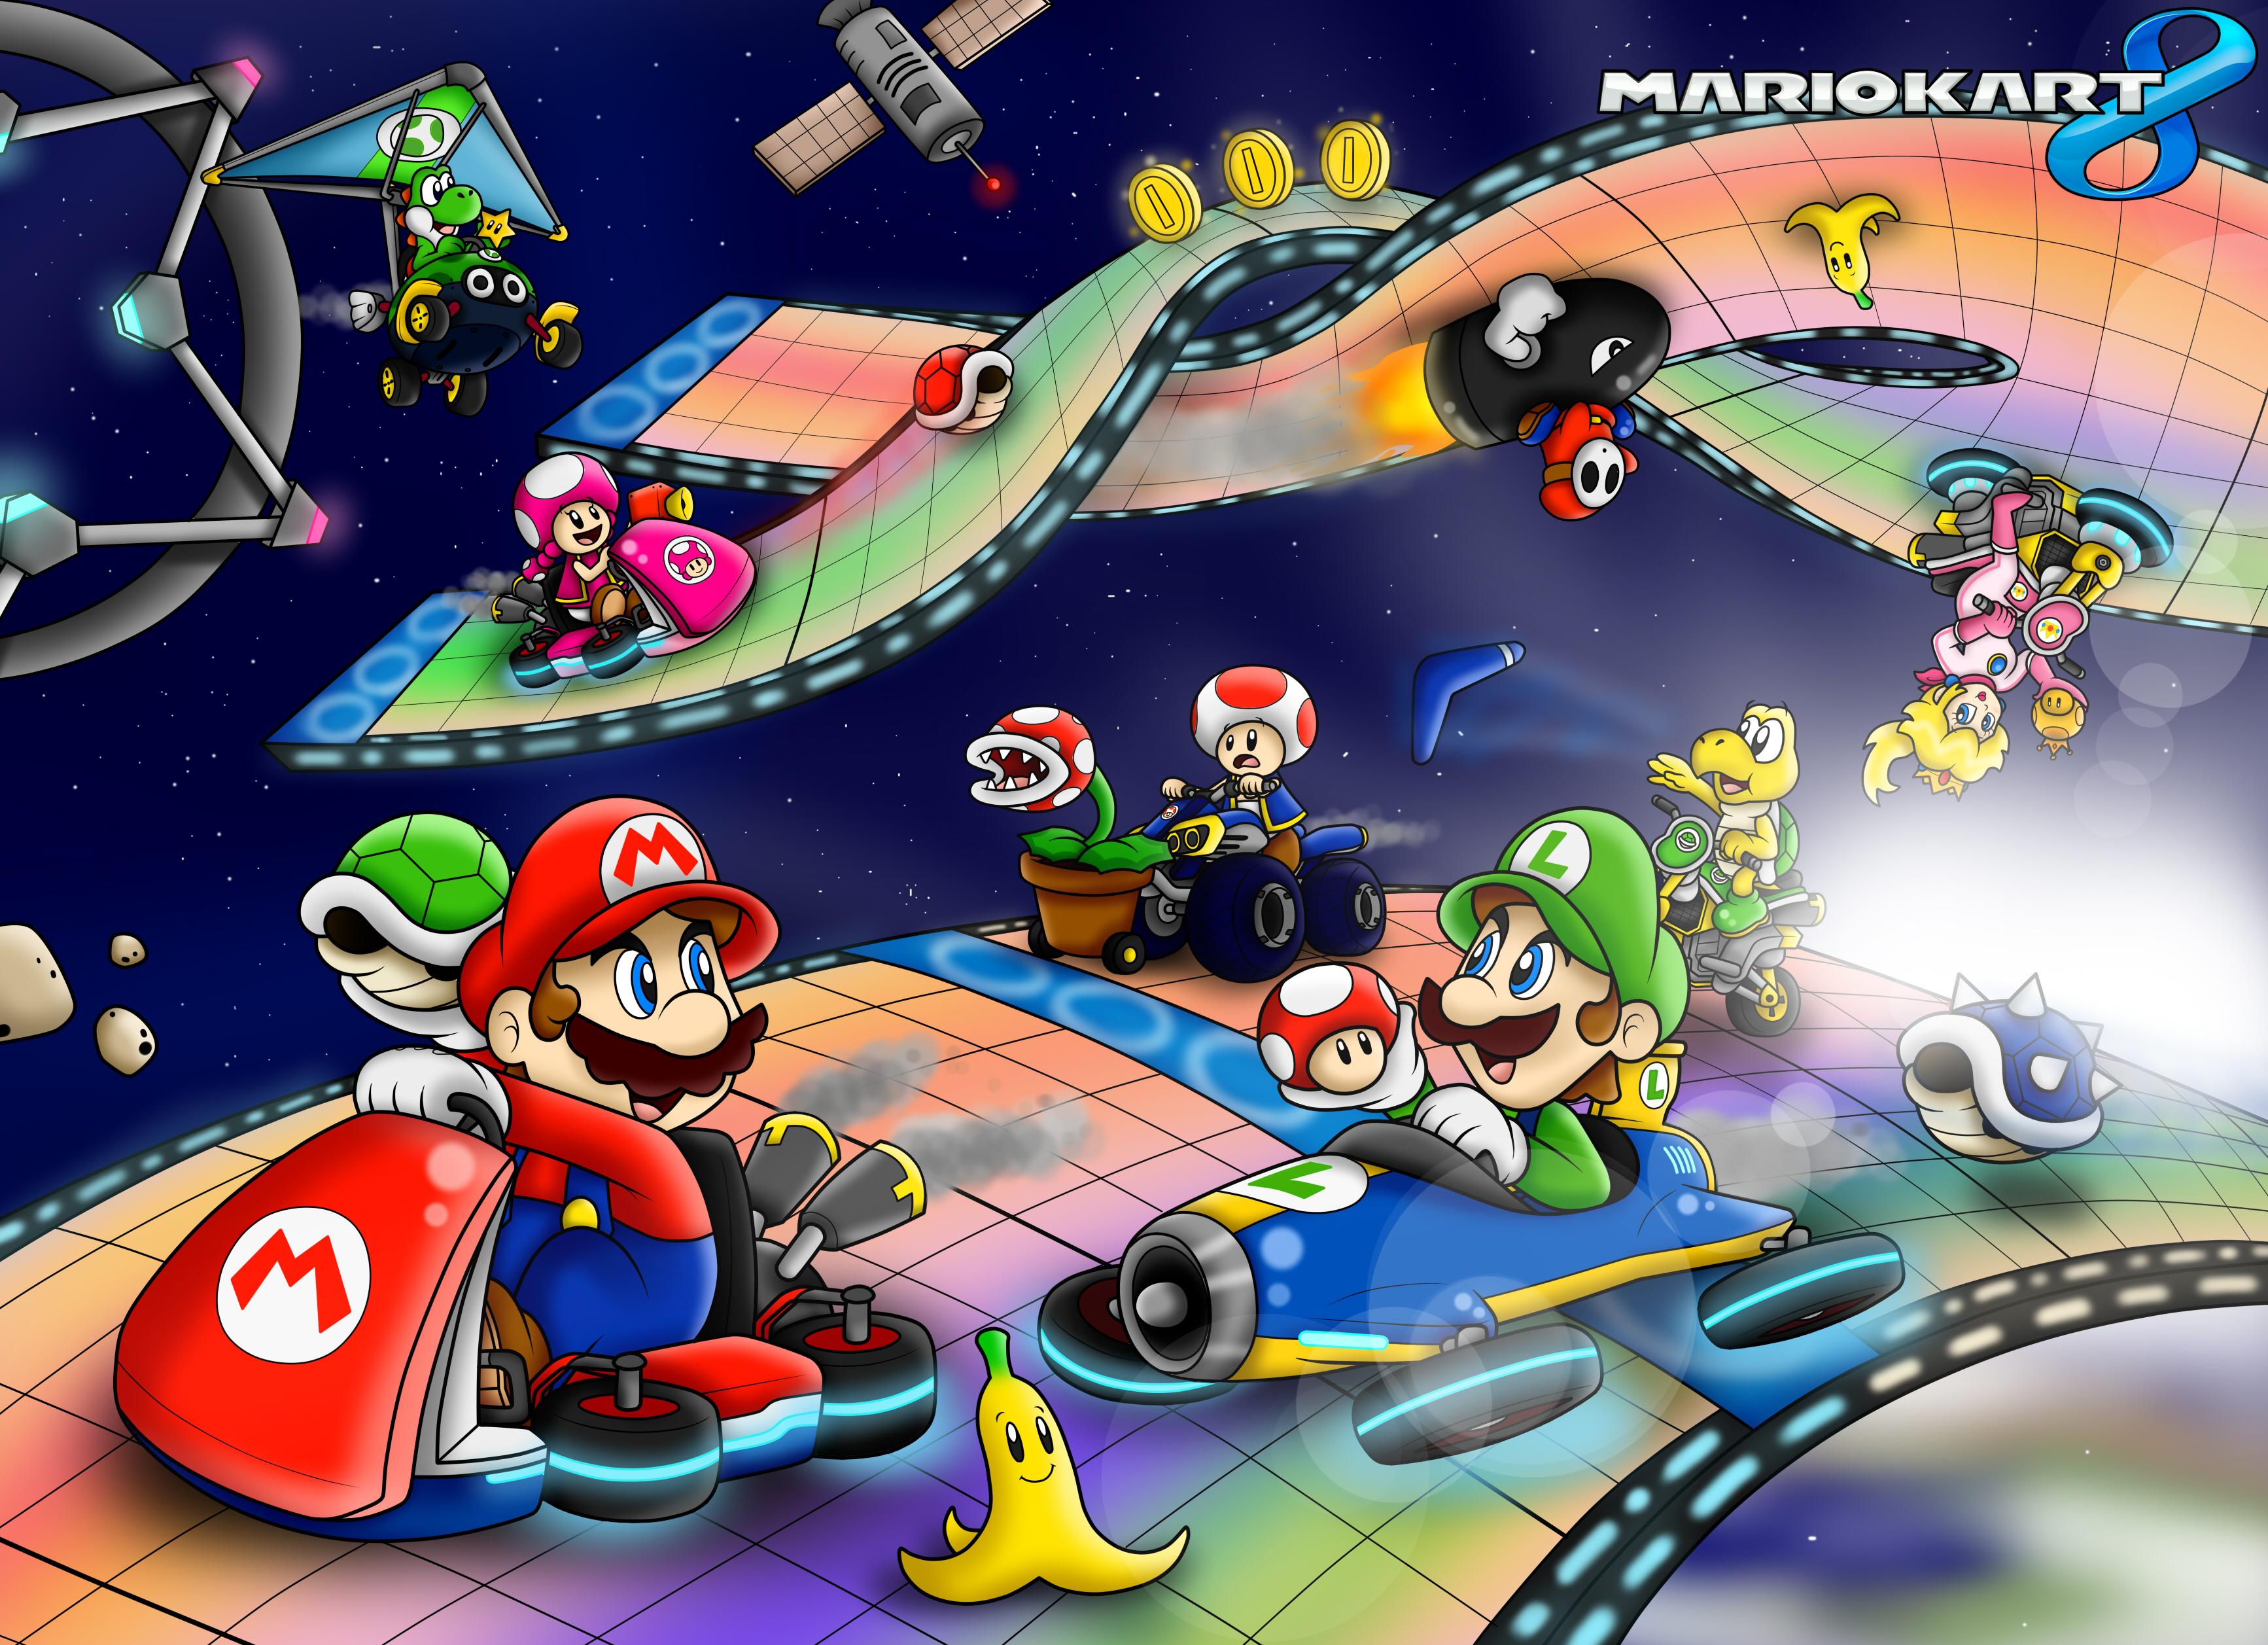 Mario Kart Iphone Wallpaper Mario Kart 8 Full Hd Fond D 233 Cran And Arri 232 Re Plan